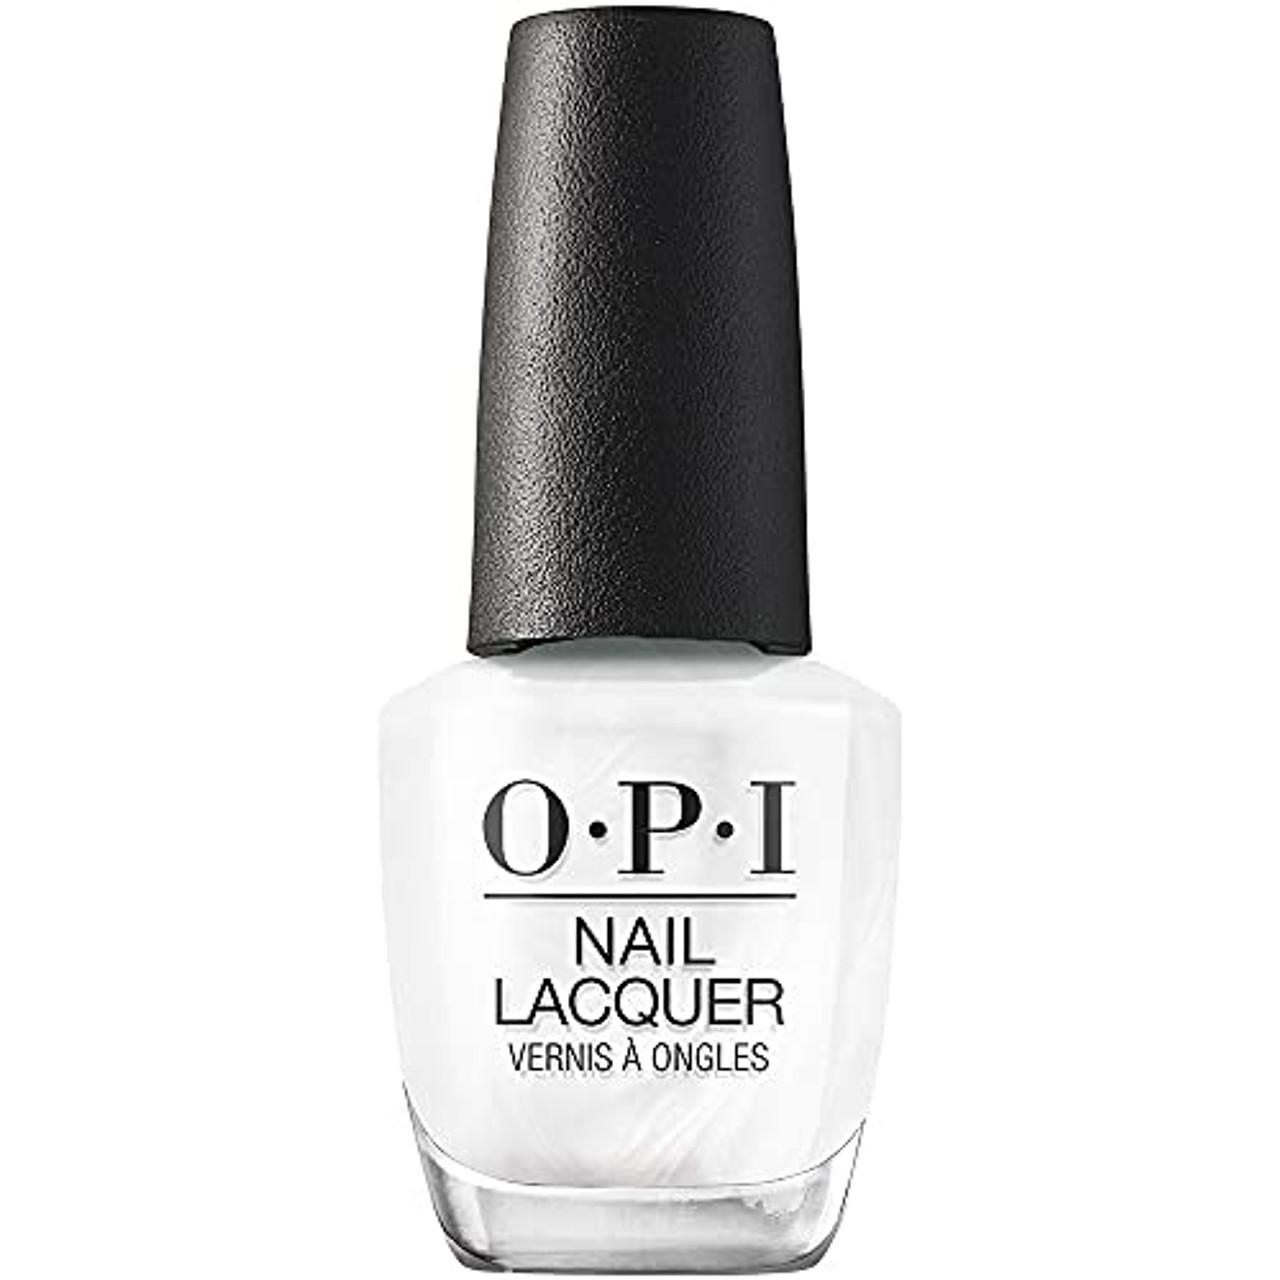 OPI Nail Lacquer Nail Polish - Snow Day In LA 0.5 Oz White